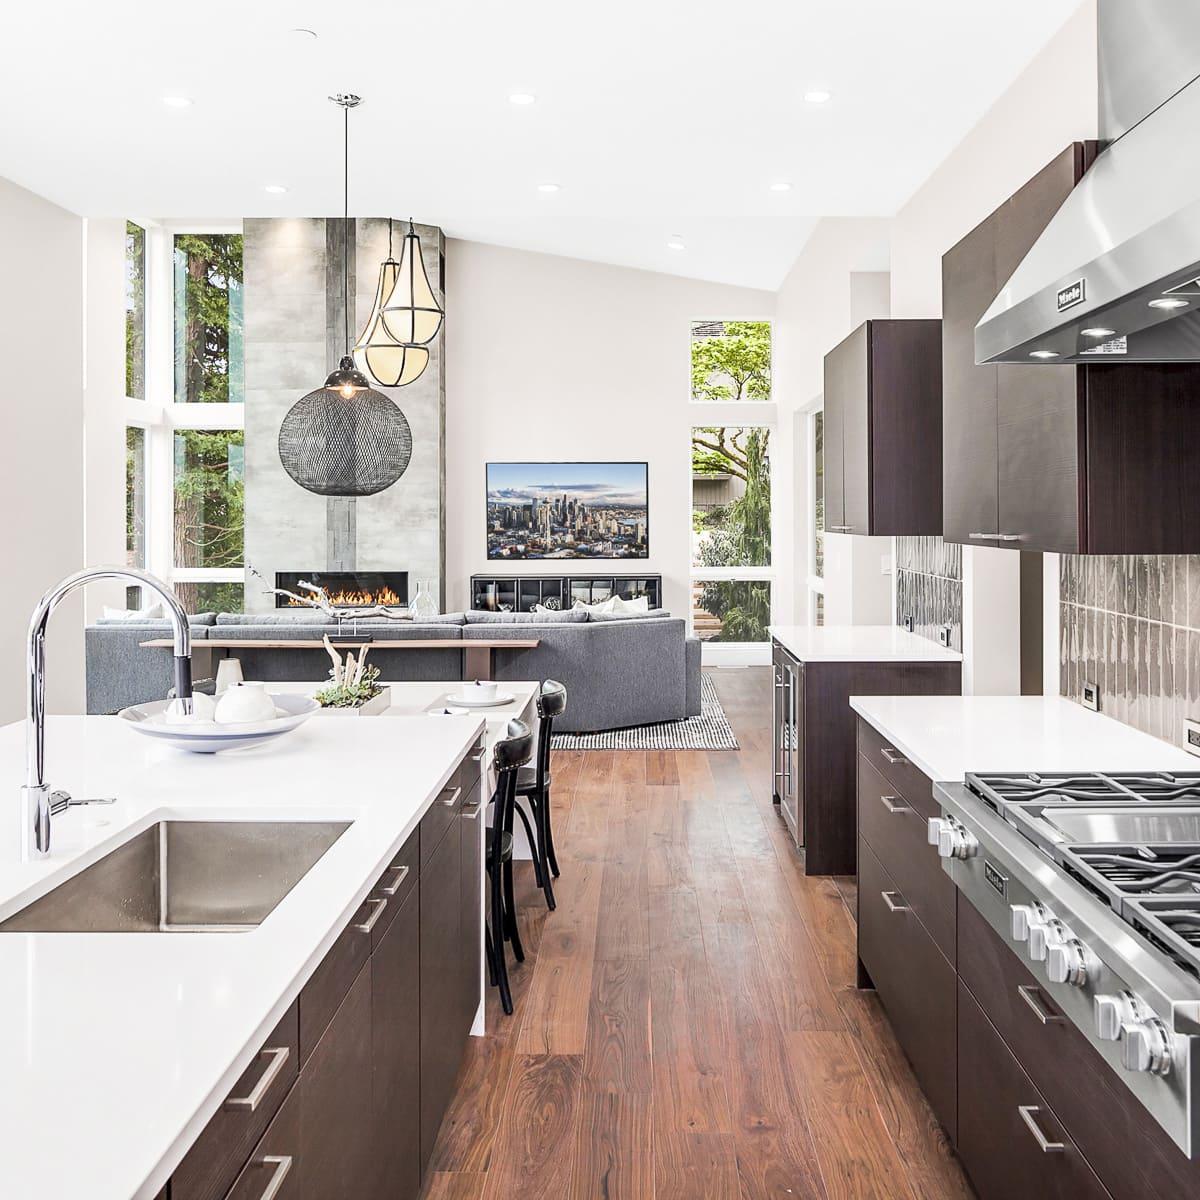 elegant and modern homes of the Summerwell development on Mercer Island